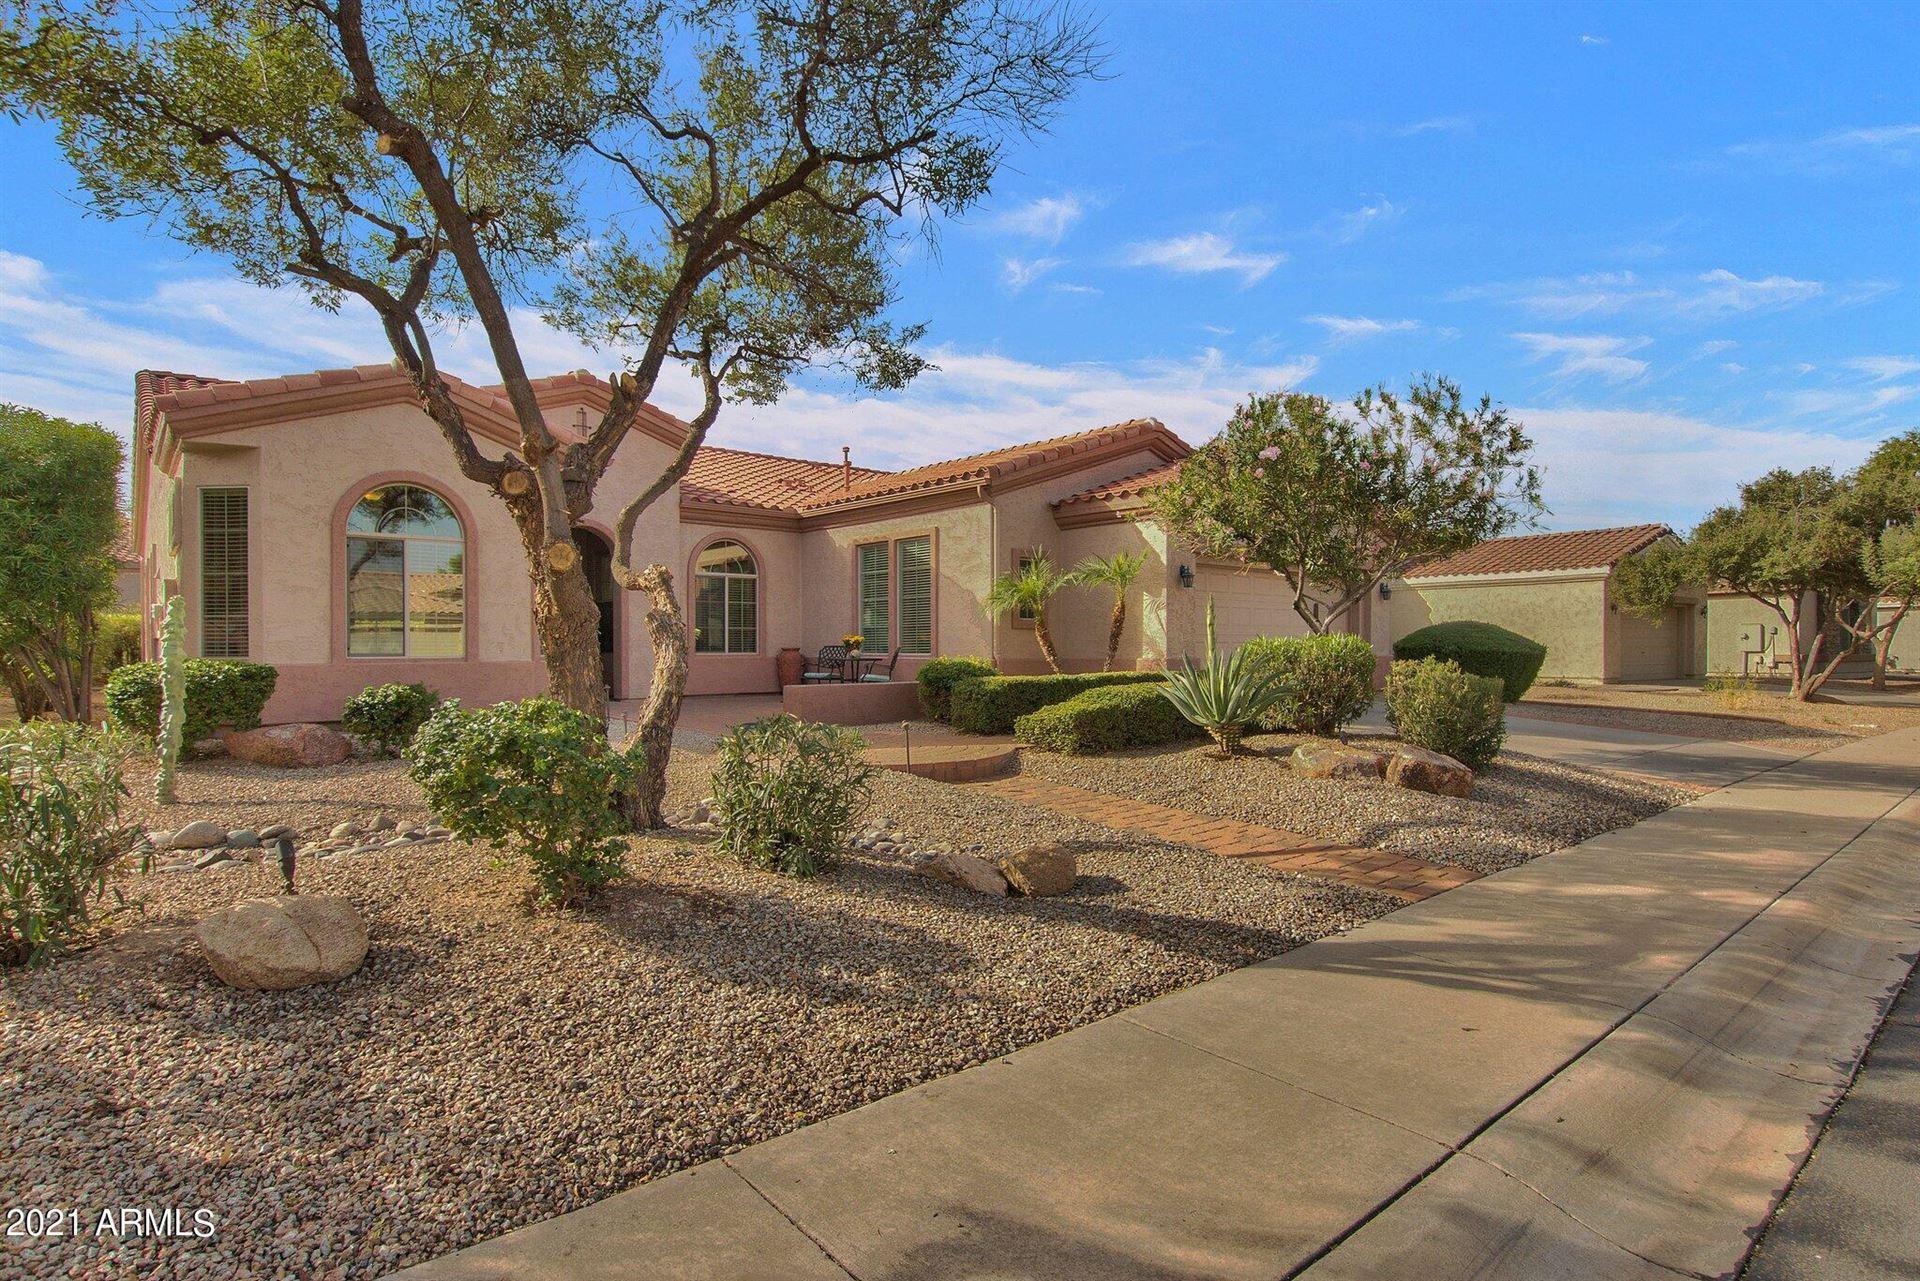 Photo of 4727 E APPLEBY Court, Gilbert, AZ 85298 (MLS # 6307637)